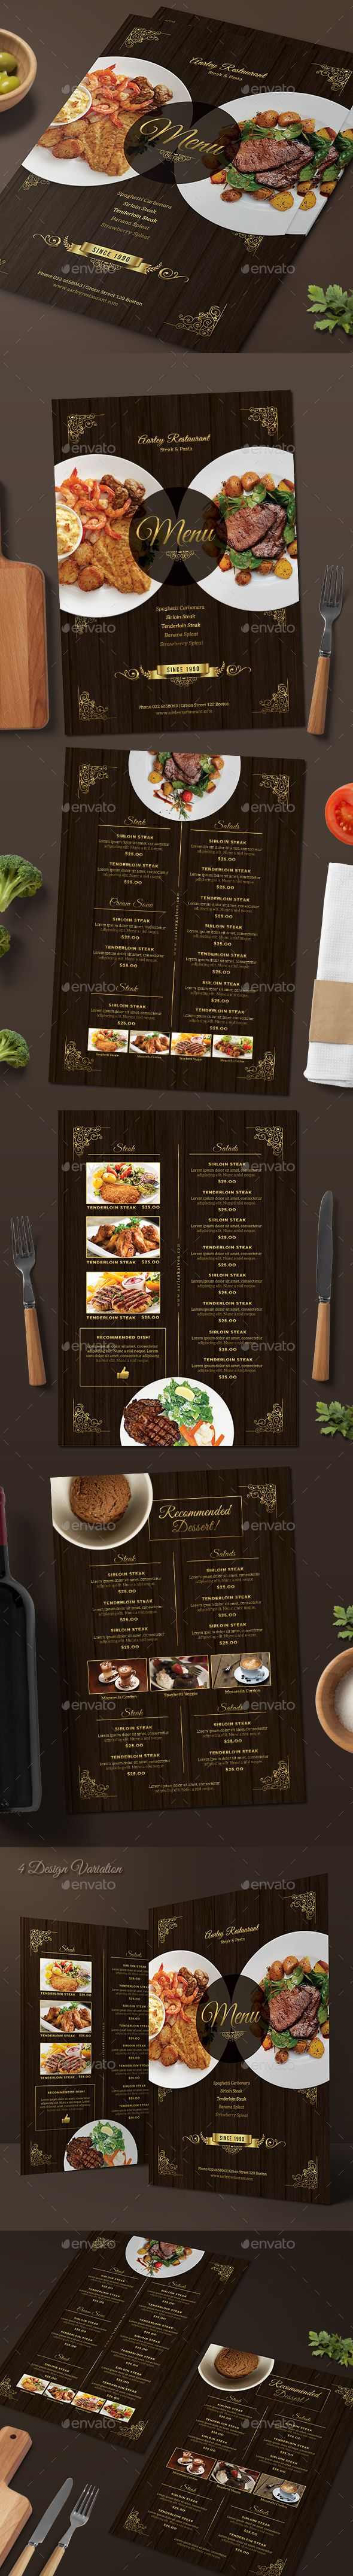 Elegant Restaurant Menu #photoshop #psd #food menu #menu • Download ➝ https://graphicriver.net/item/elegant-restaurant-menu/18590107?ref=pxcr